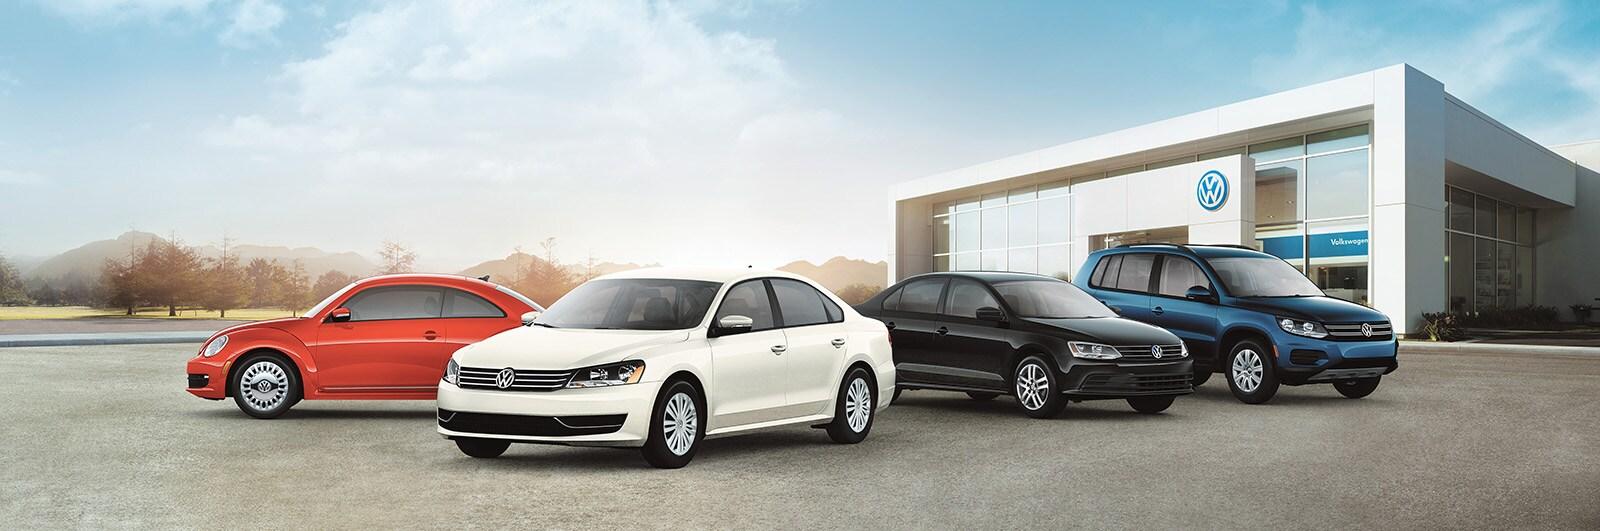 Orlando Area Volkswagen Dealership Car Repair Amp Parts